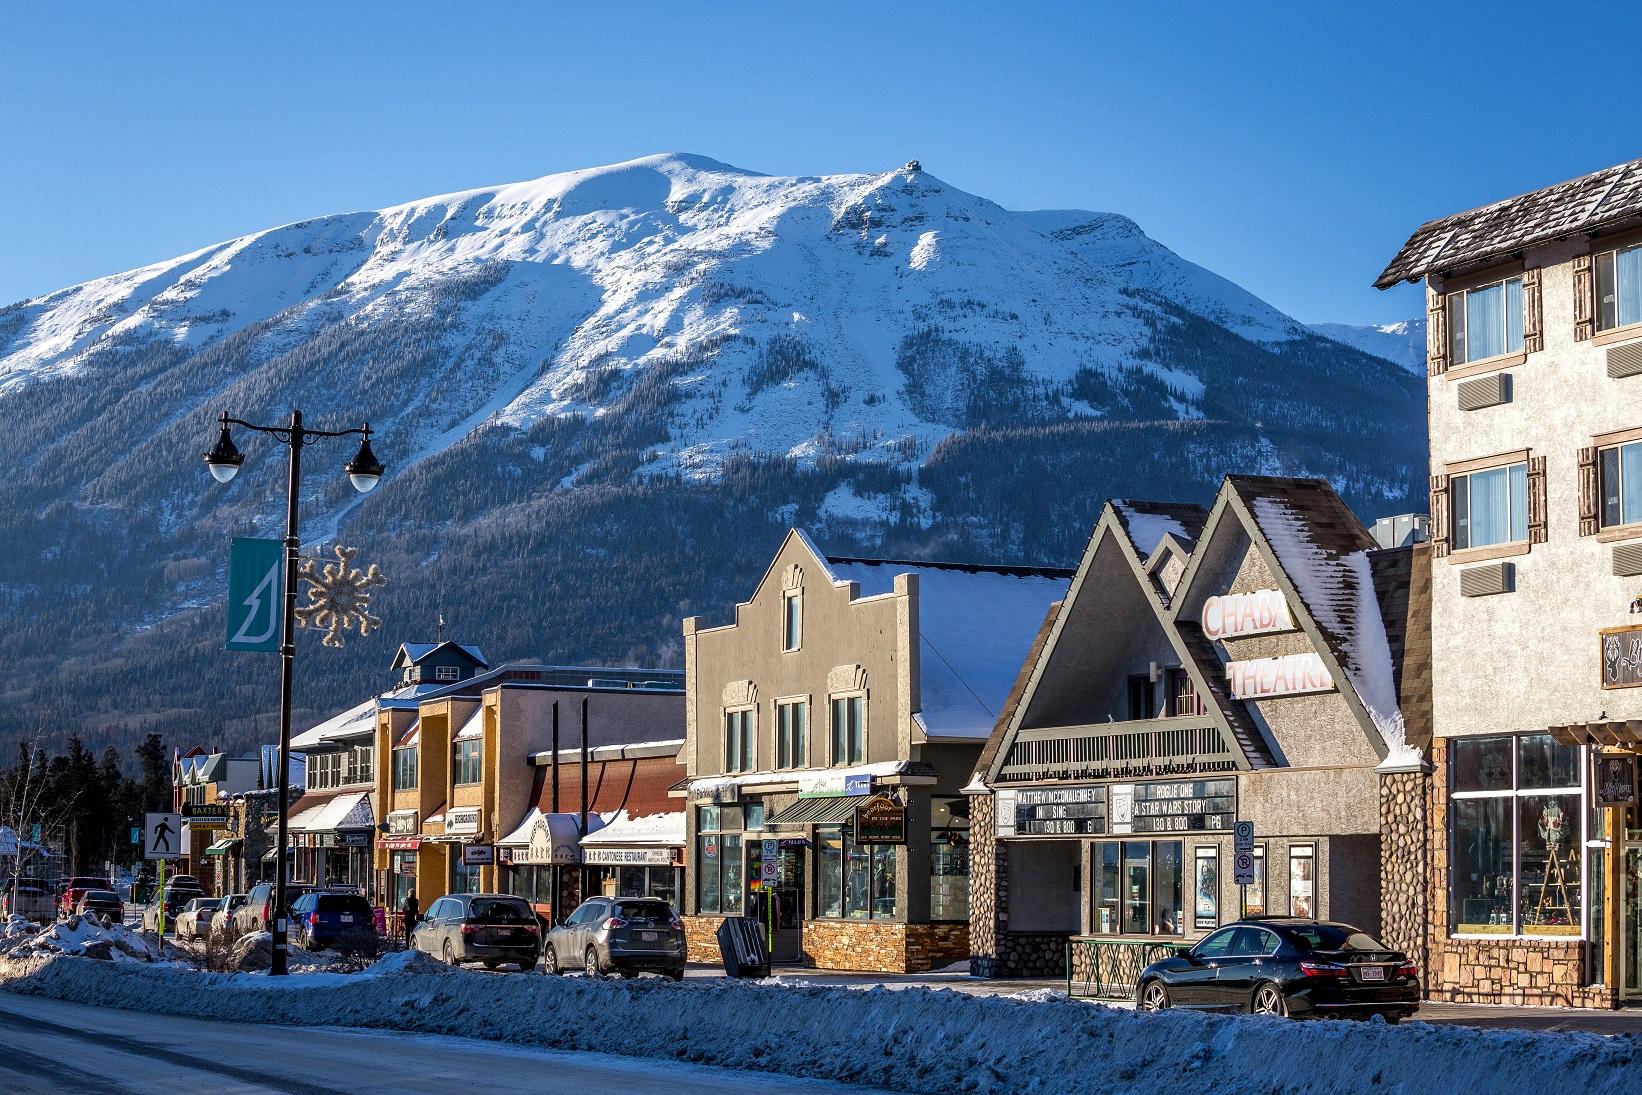 November in Jasper: Where to be for Canada 150 - Blog Viarail